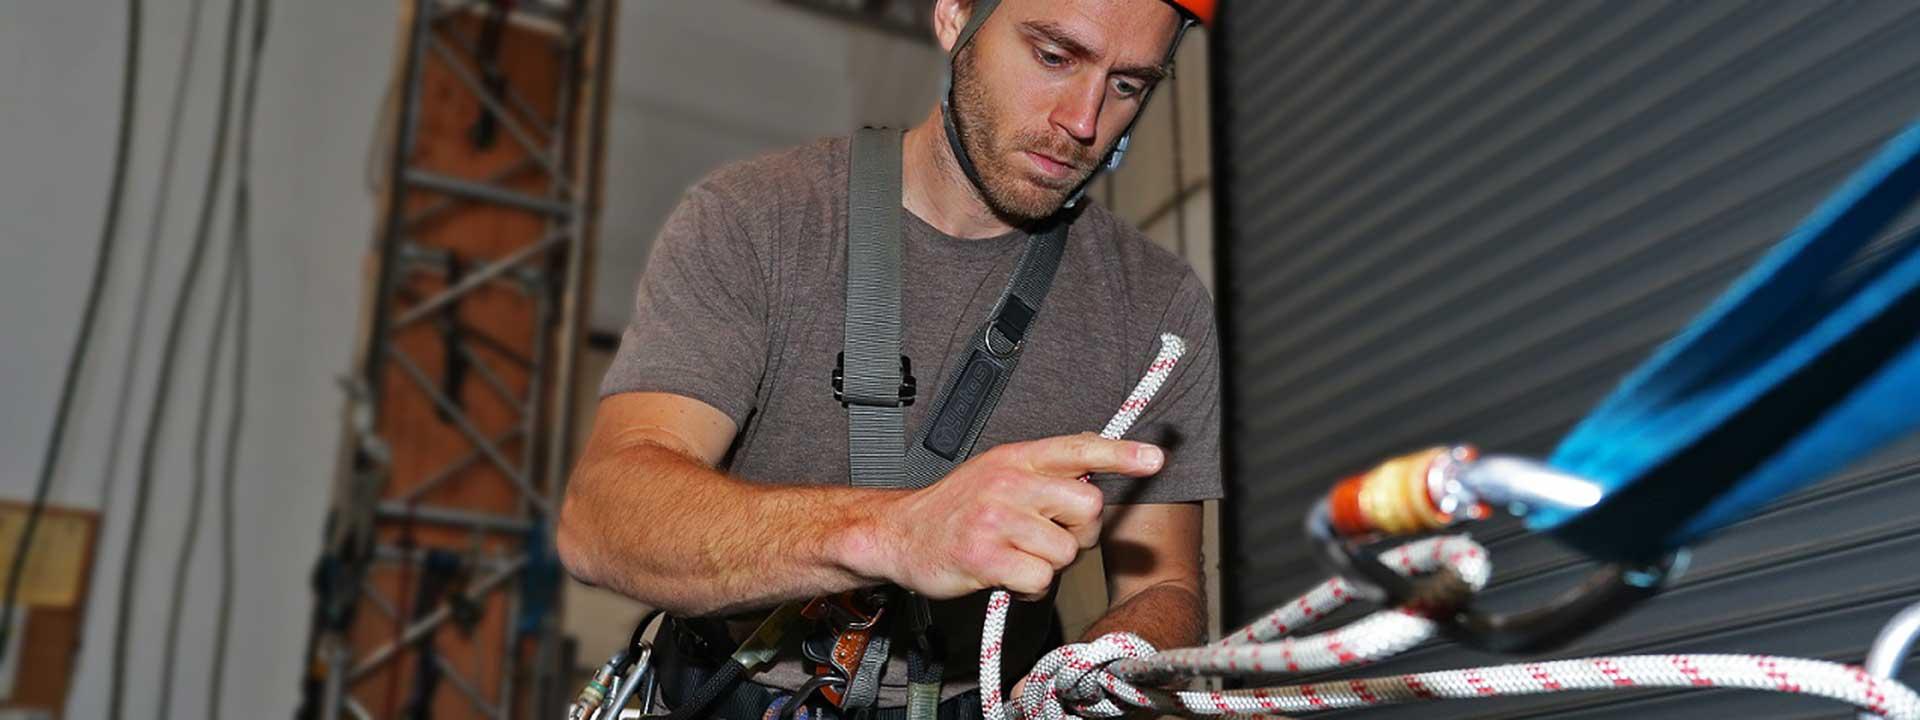 Rope access technician tying knots